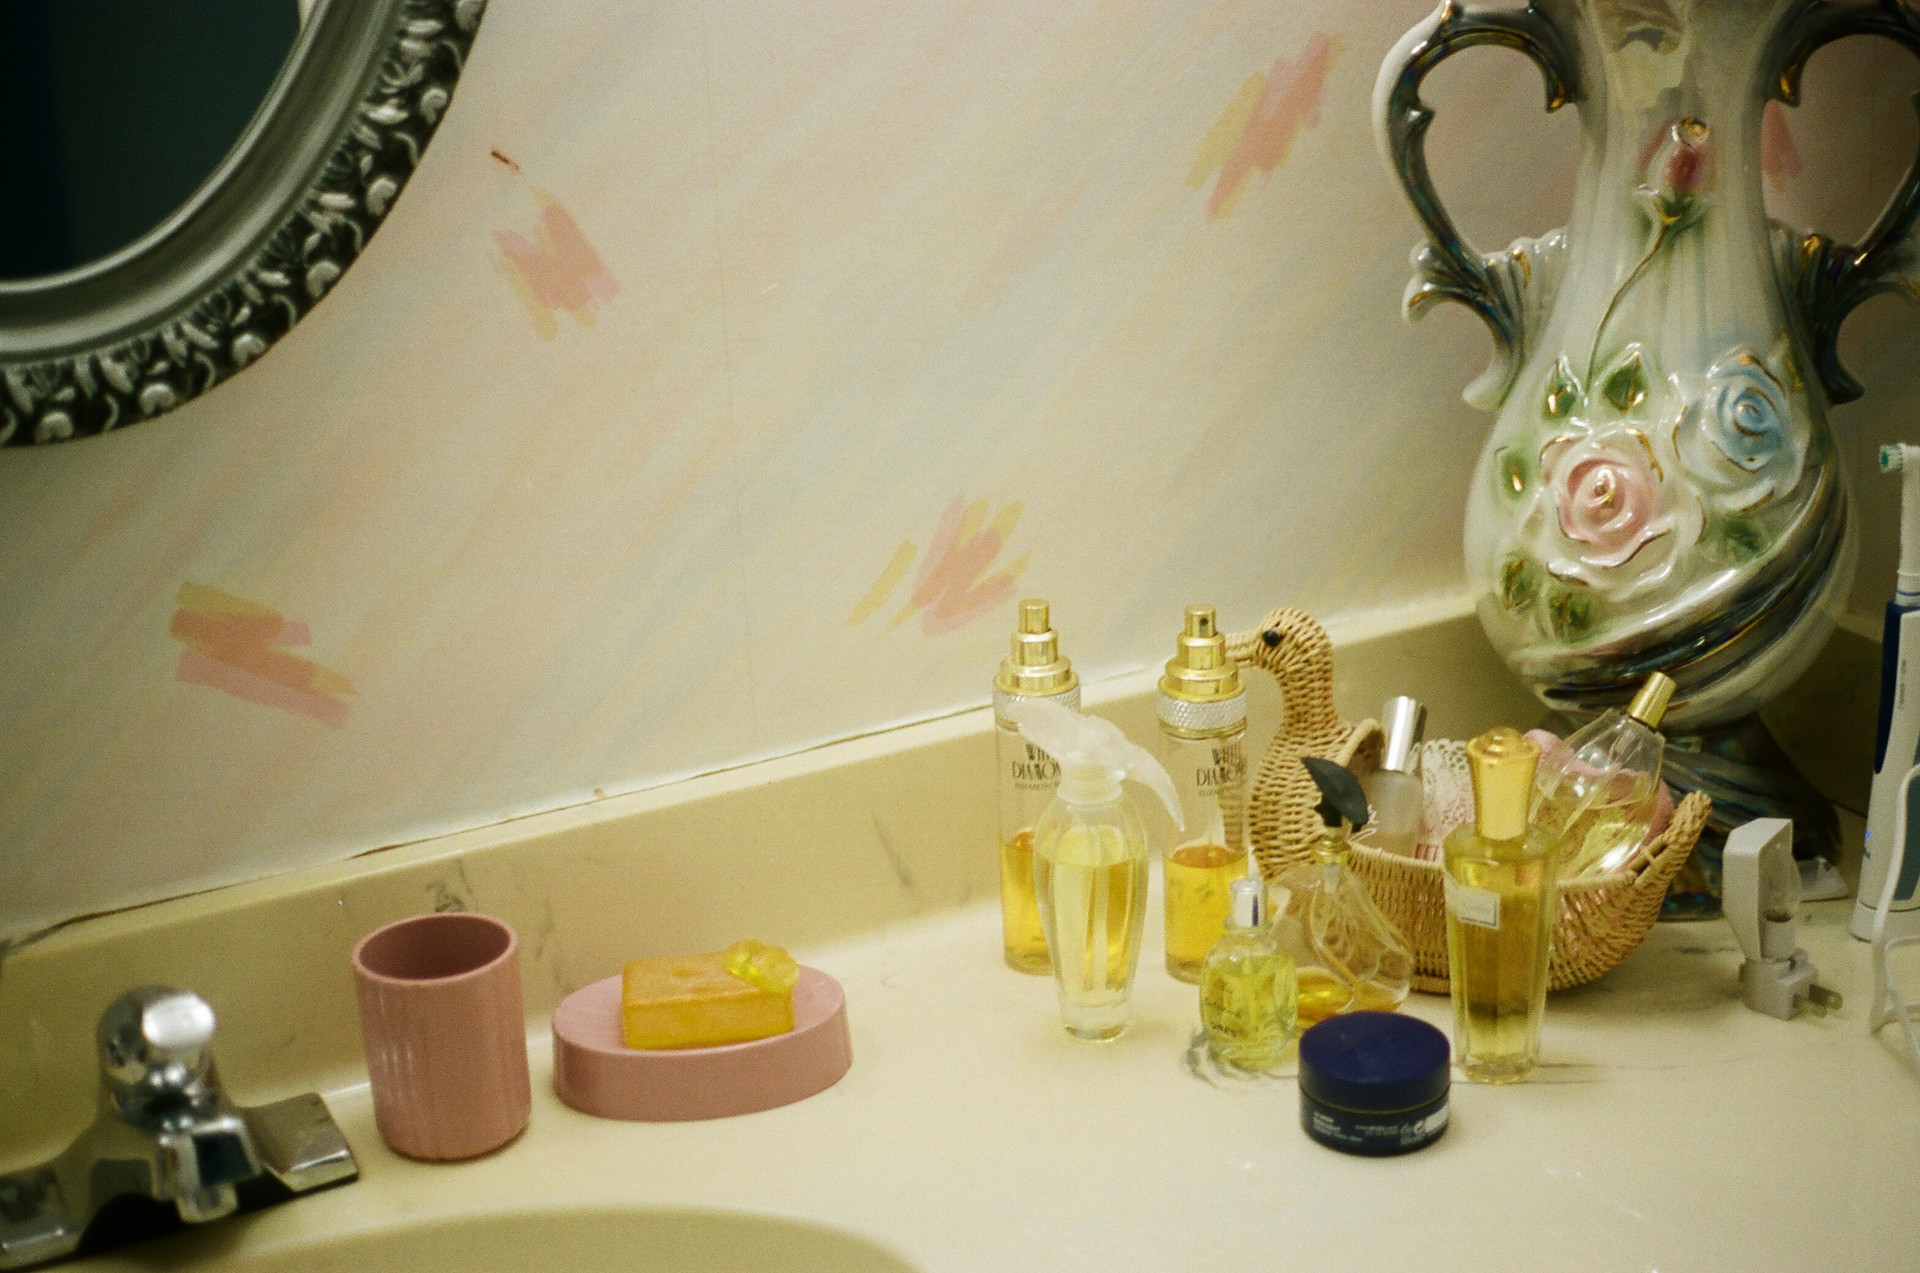 GRANDMA'S BATHROOM